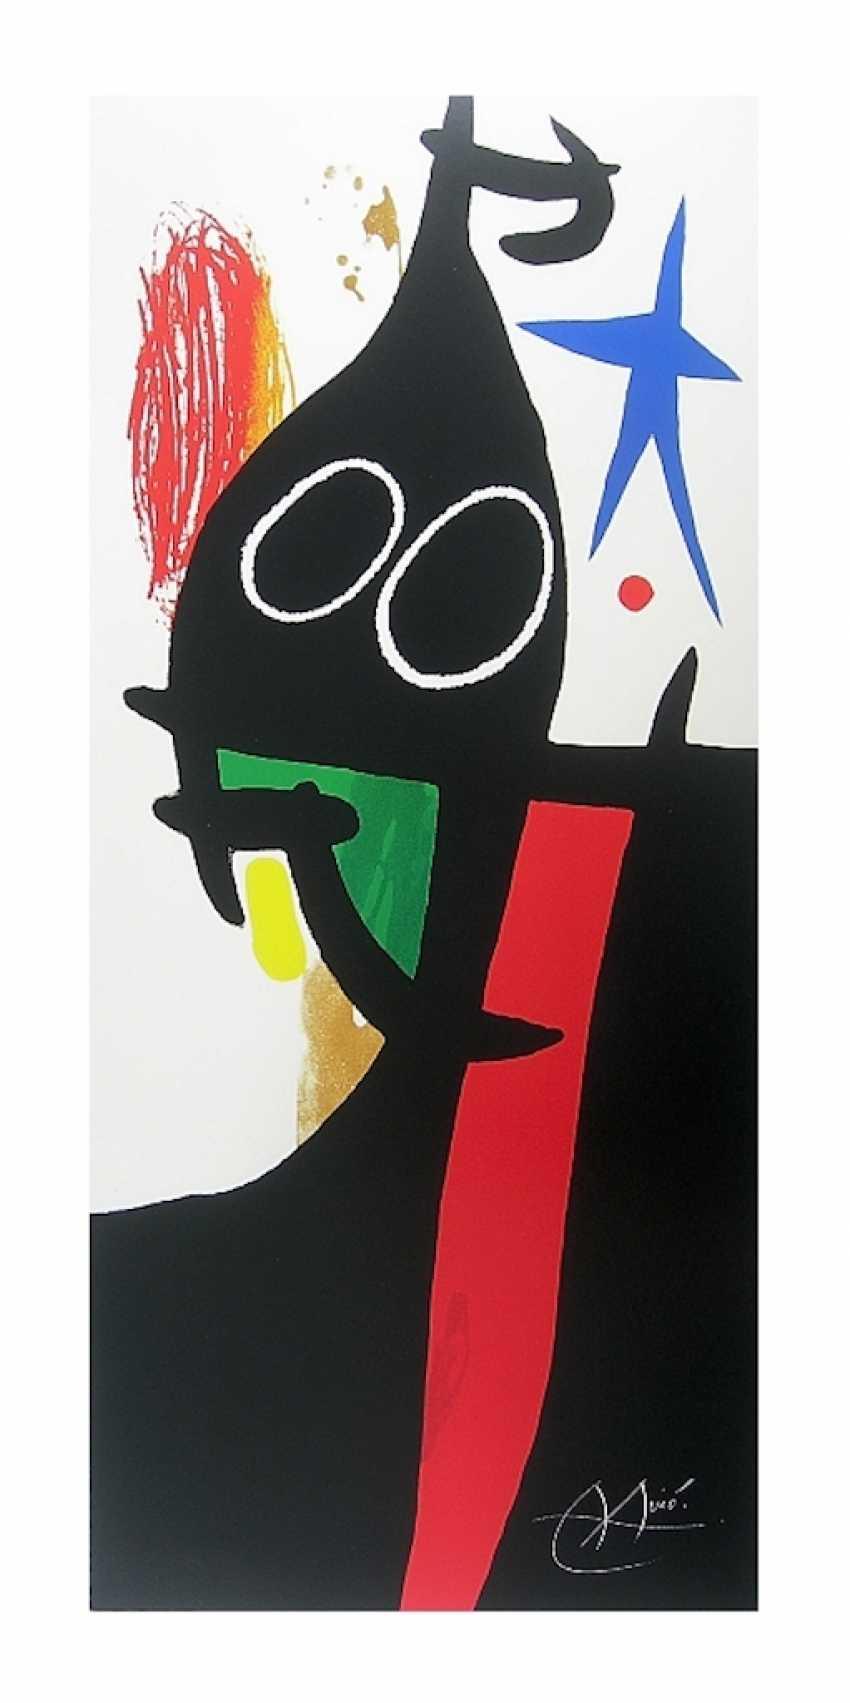 "Joan Miro: ""The Buckwheat has the blue star"", 1973. Offset, 1993. - photo 1"